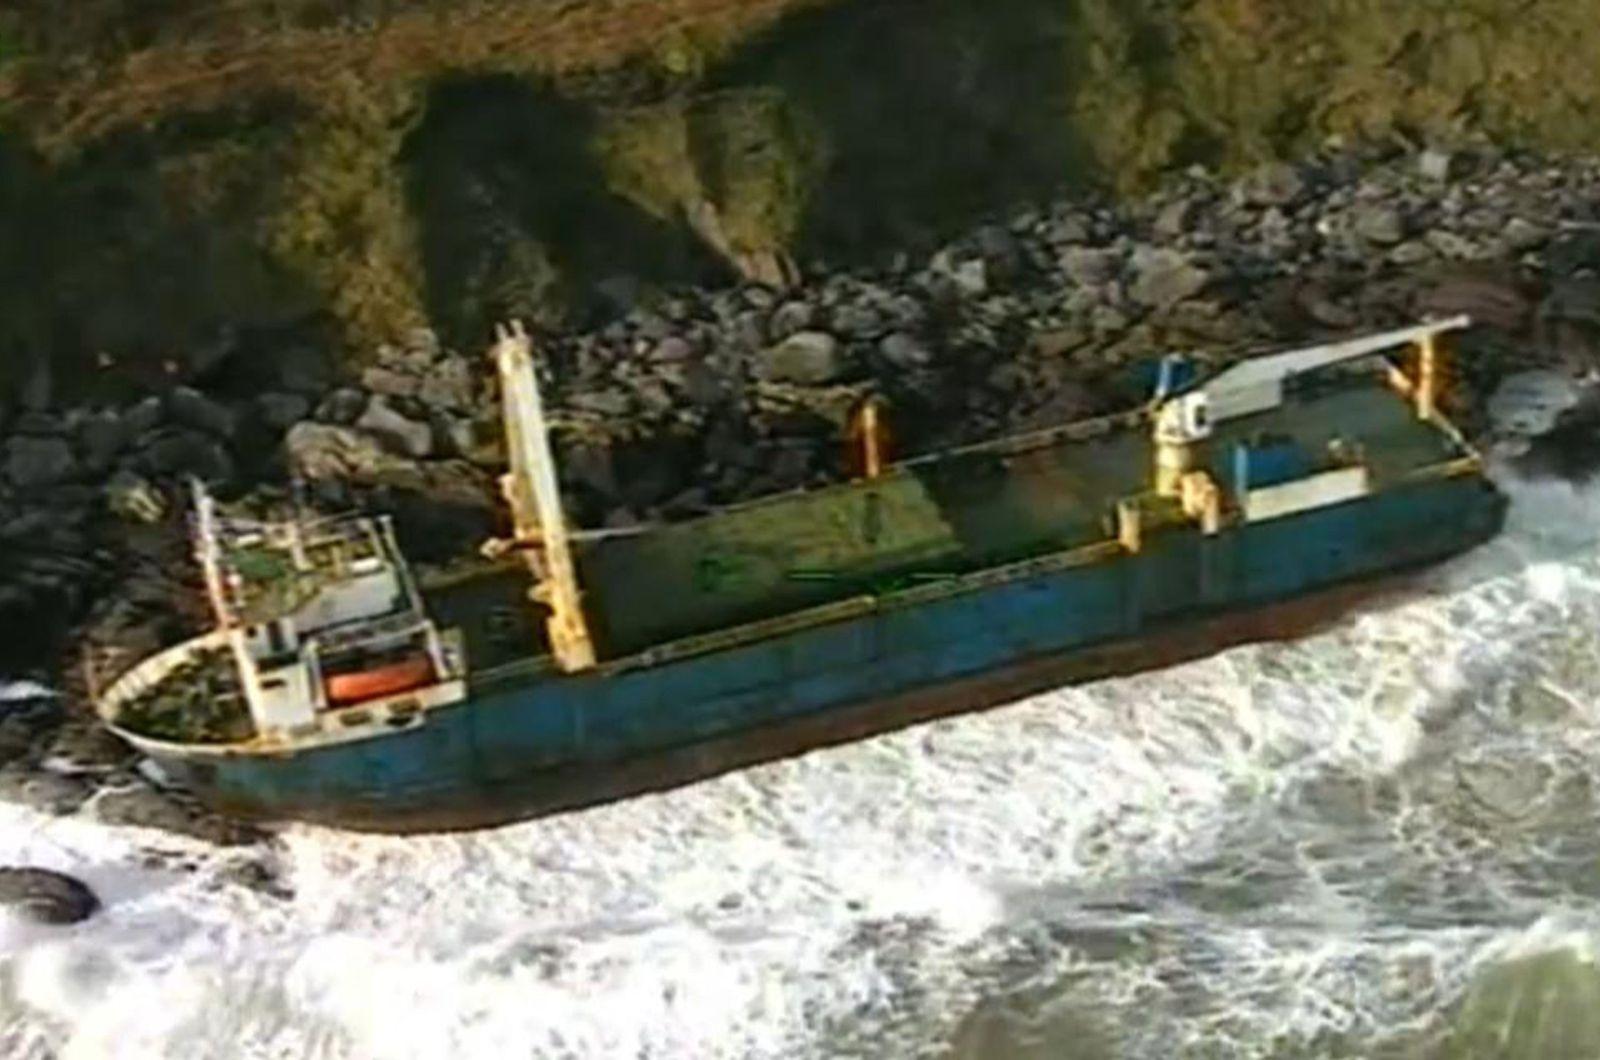 IRELAND-EUROPE-MARITIME-WEATHER-SHIPPING-TRANSPORT